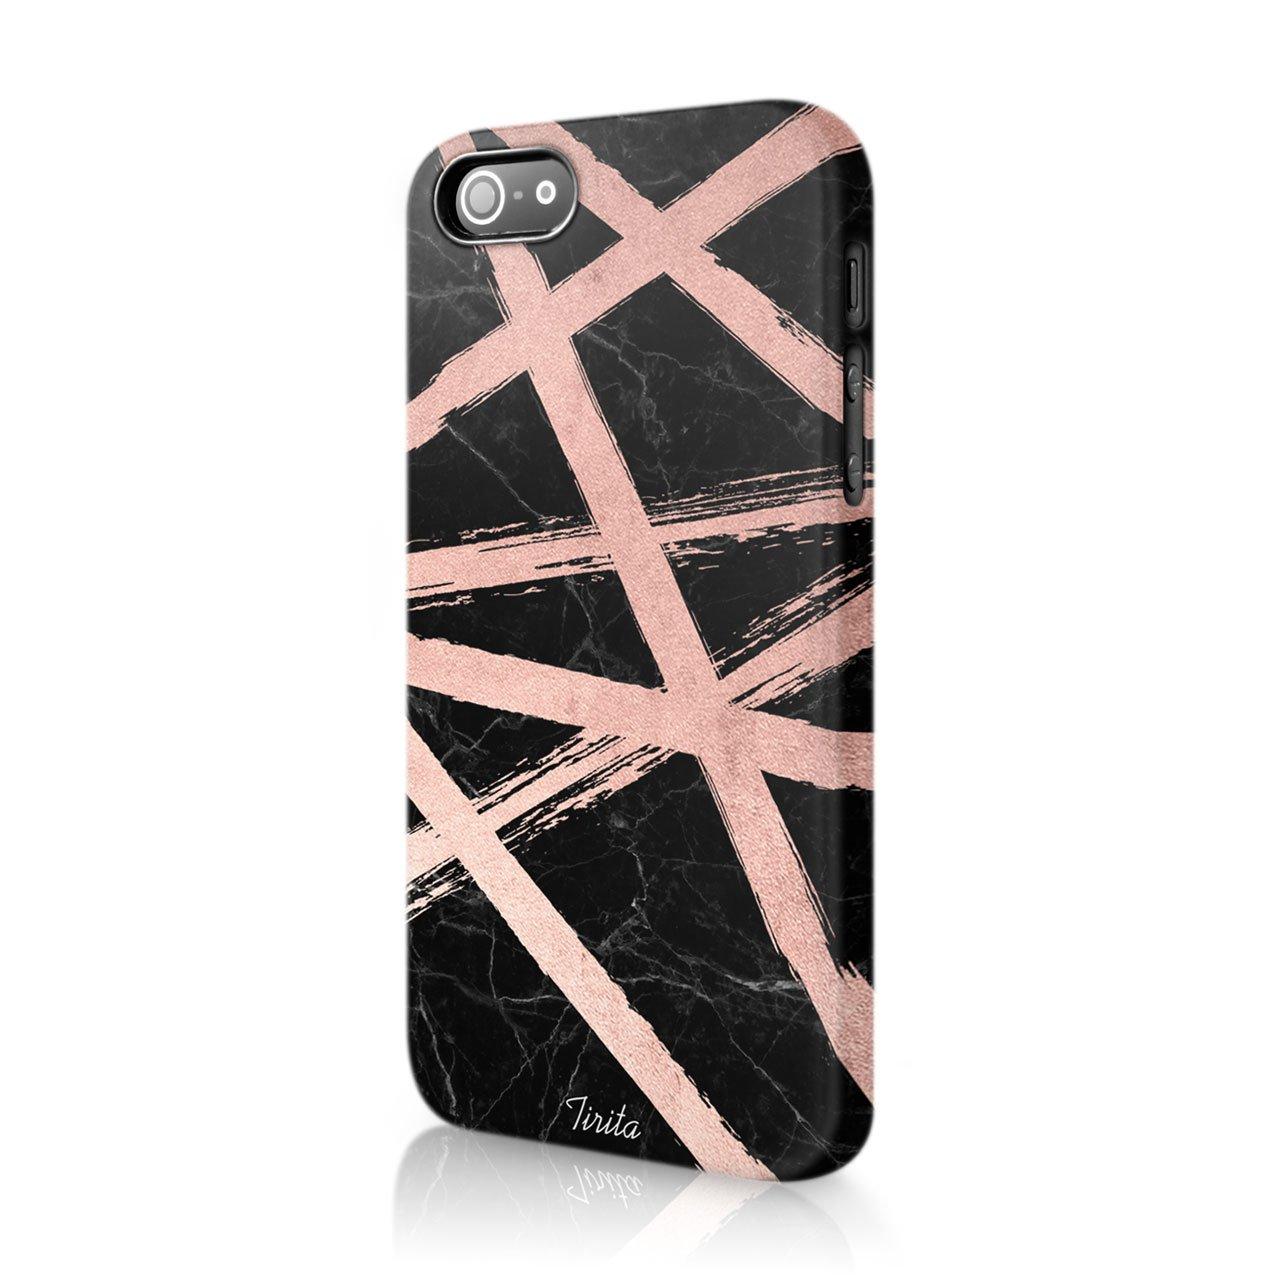 11 Tirita duro funda carcasa rosa oro m/ármol con purpurina Trendy Fashion regalo Present Cute dise/ño Motorola Moto G4 /& G4 Plus